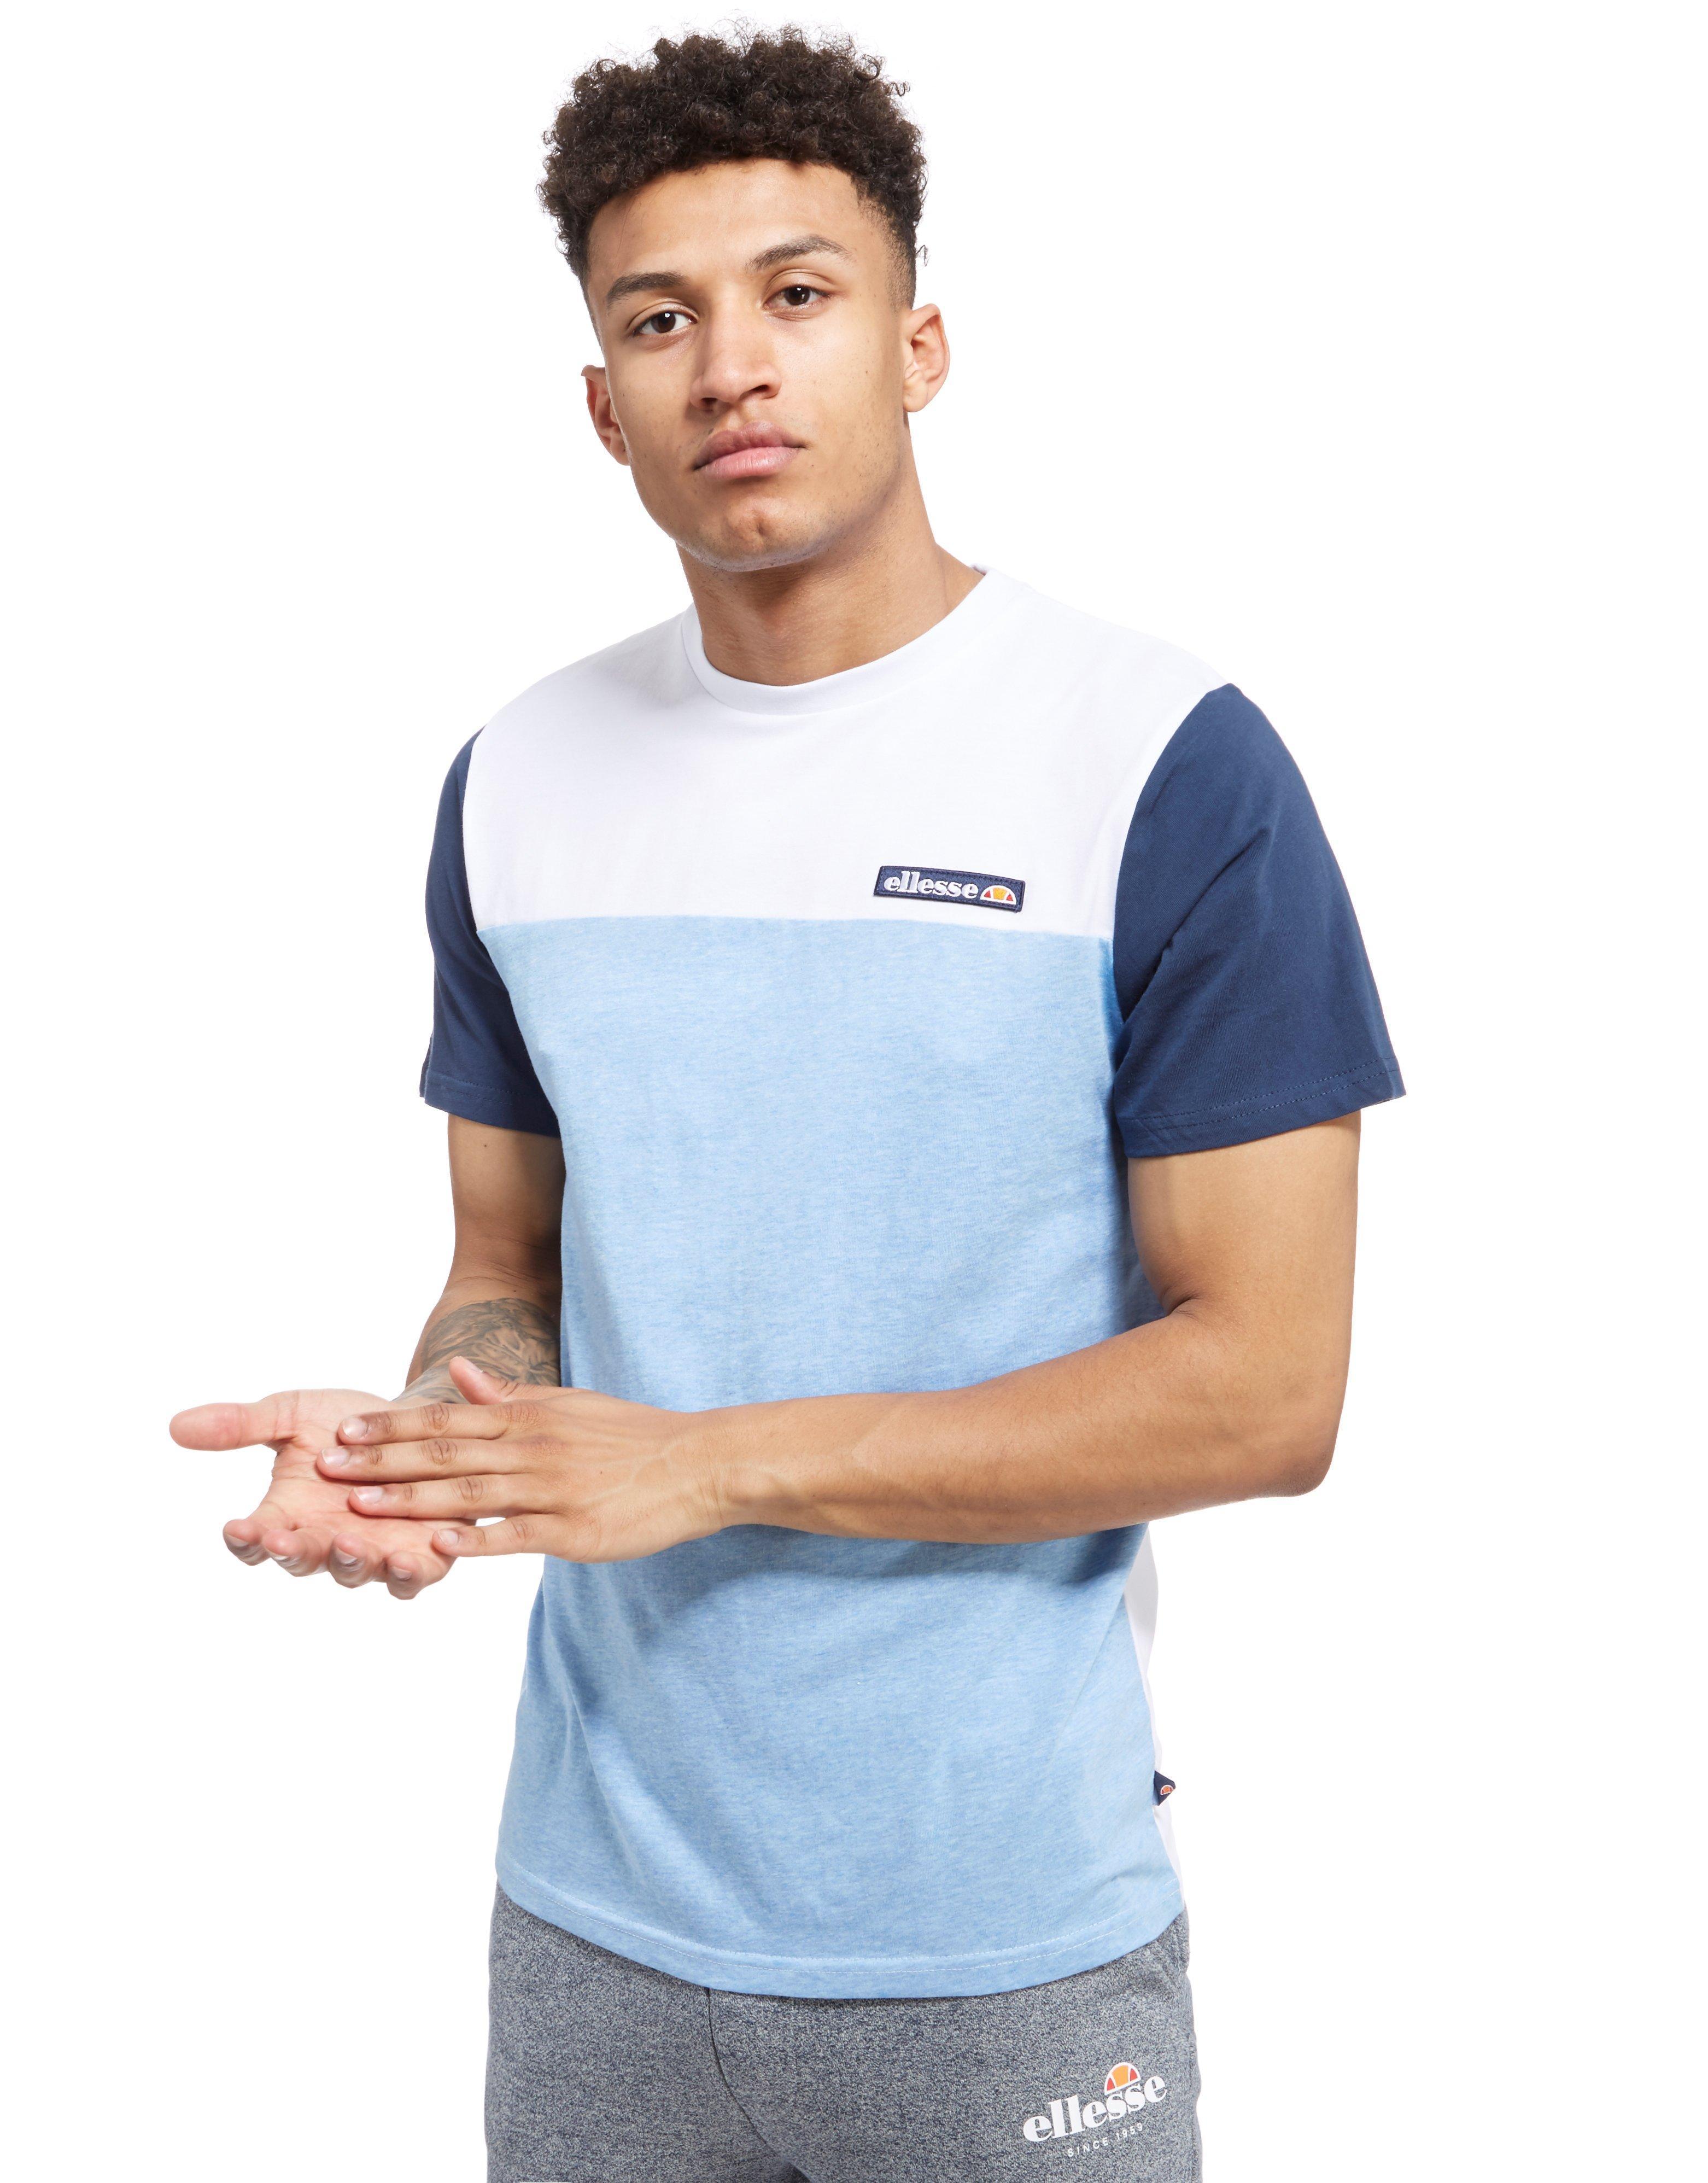 ellesse paltrio colour block t shirt in blue for men lyst. Black Bedroom Furniture Sets. Home Design Ideas